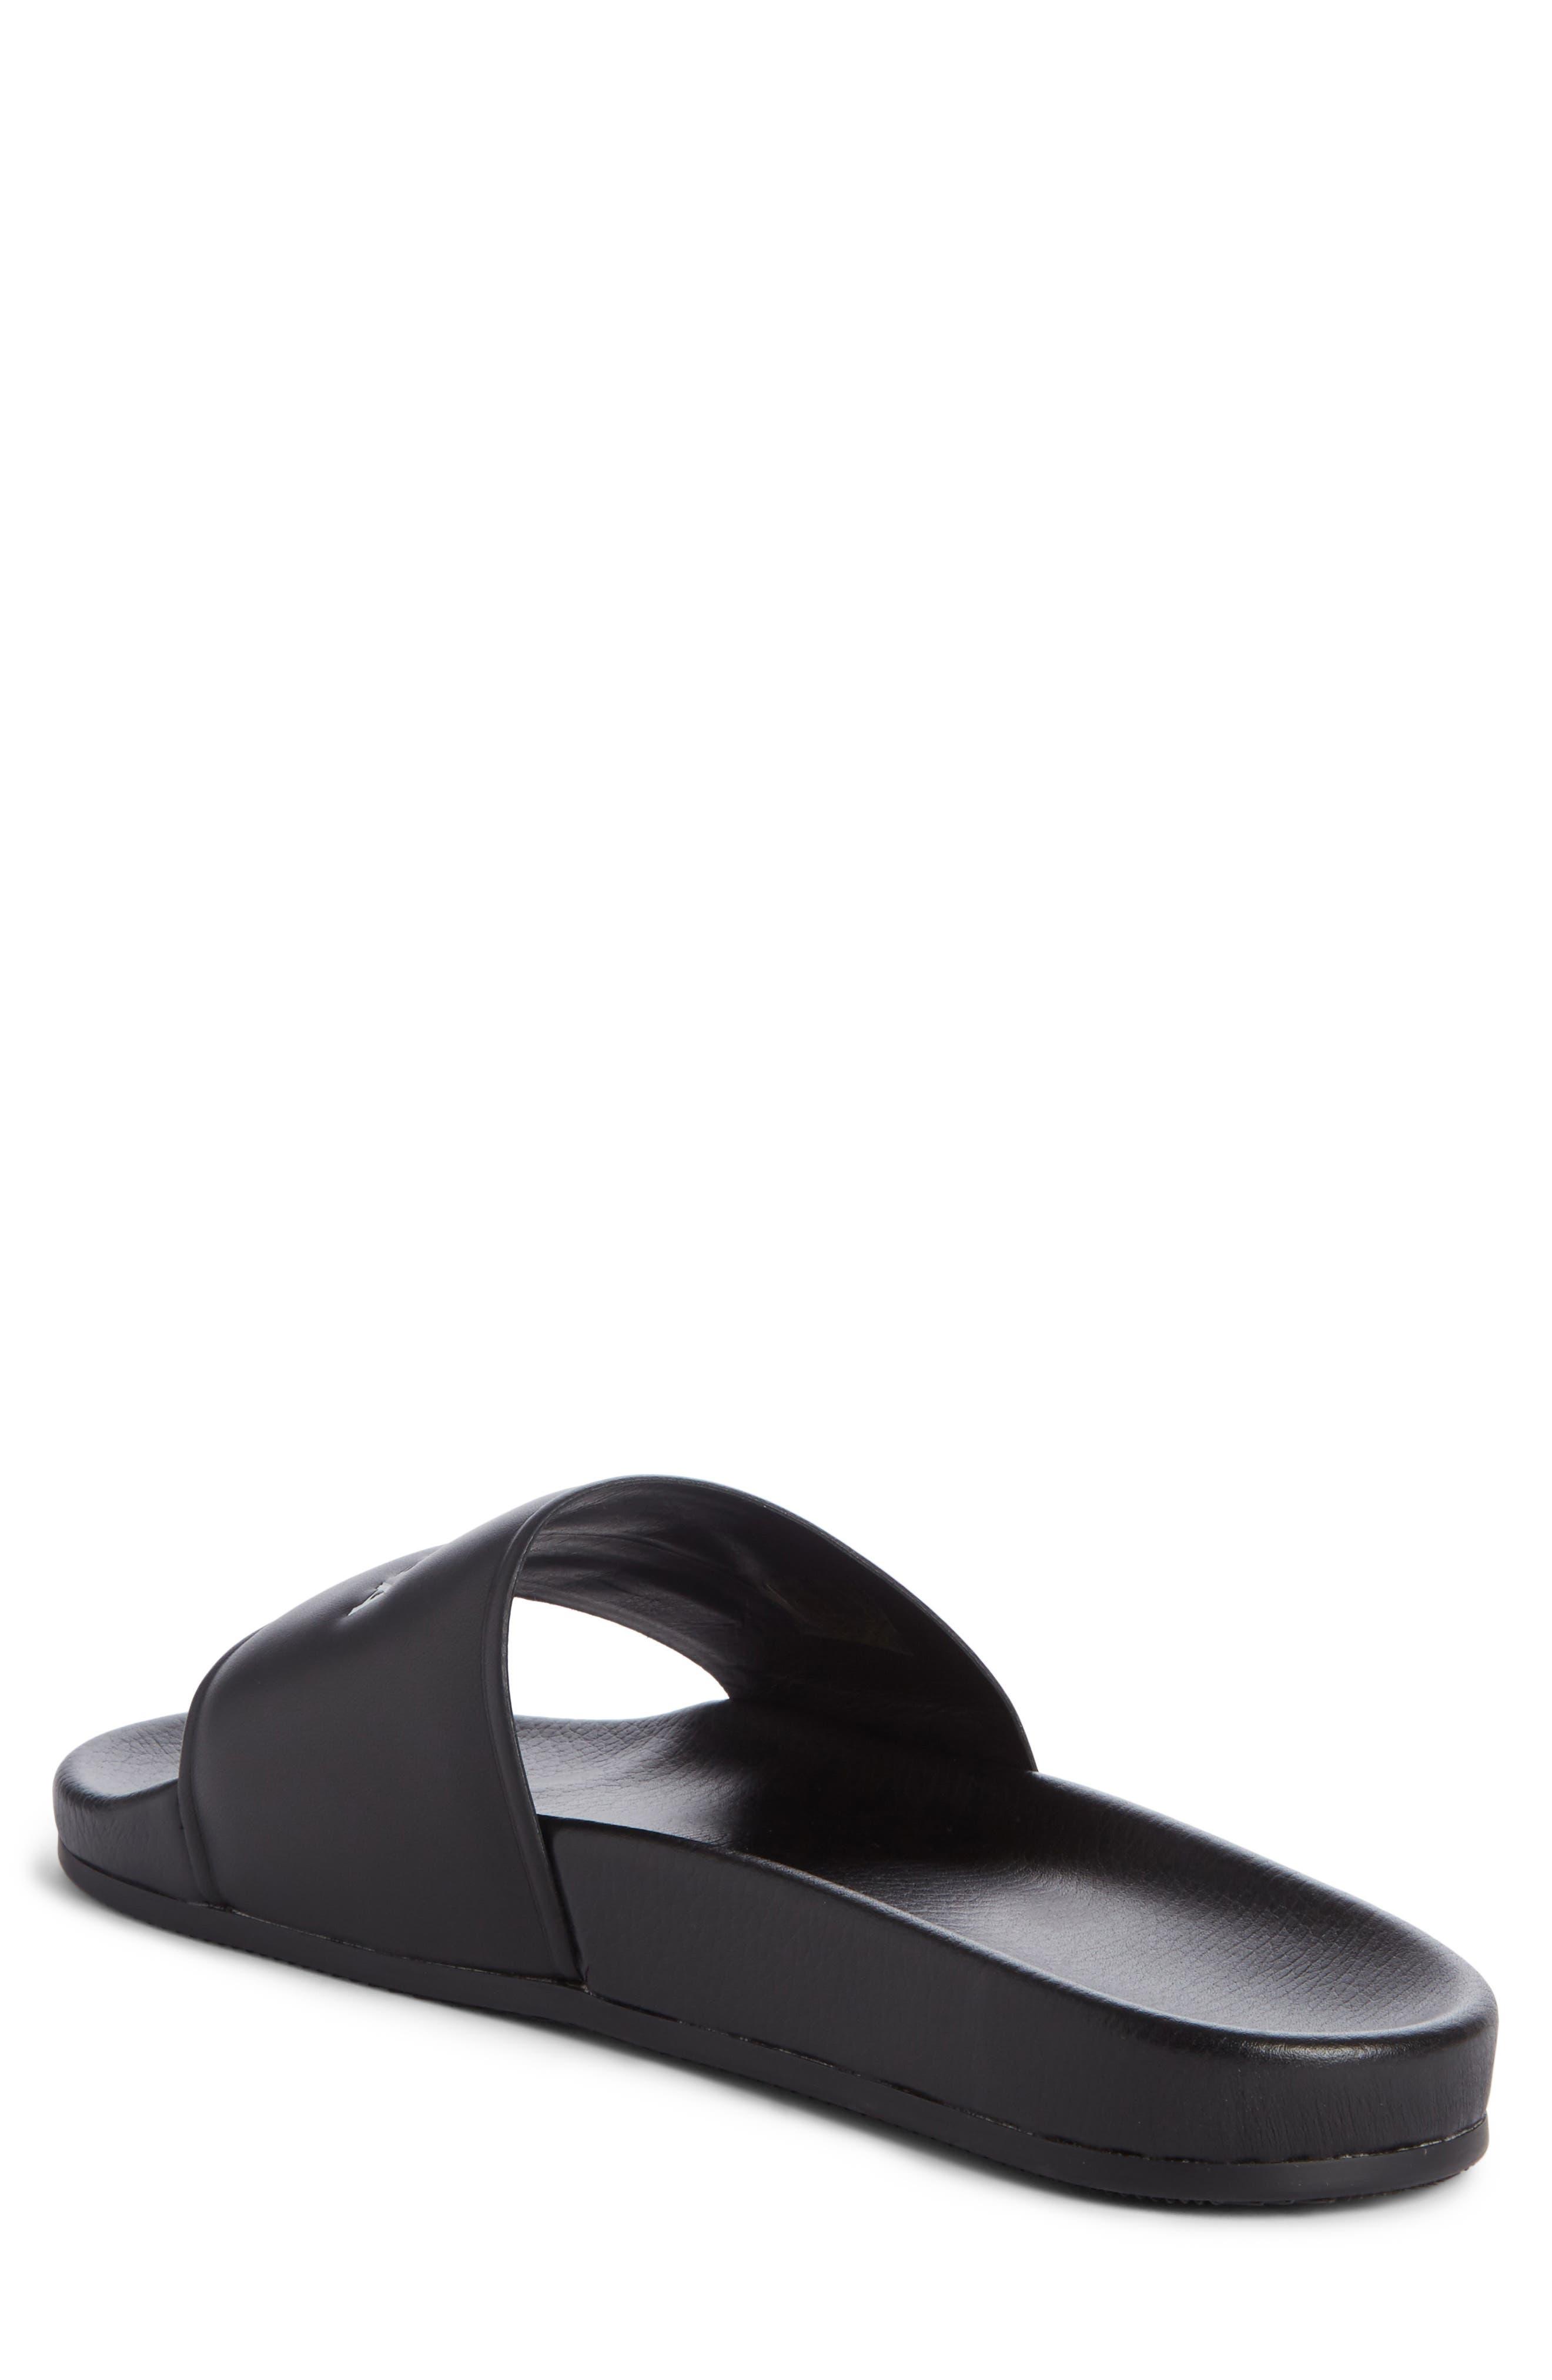 Alternate Image 2  - Balenciaga Logo Slide Sandal (Men)